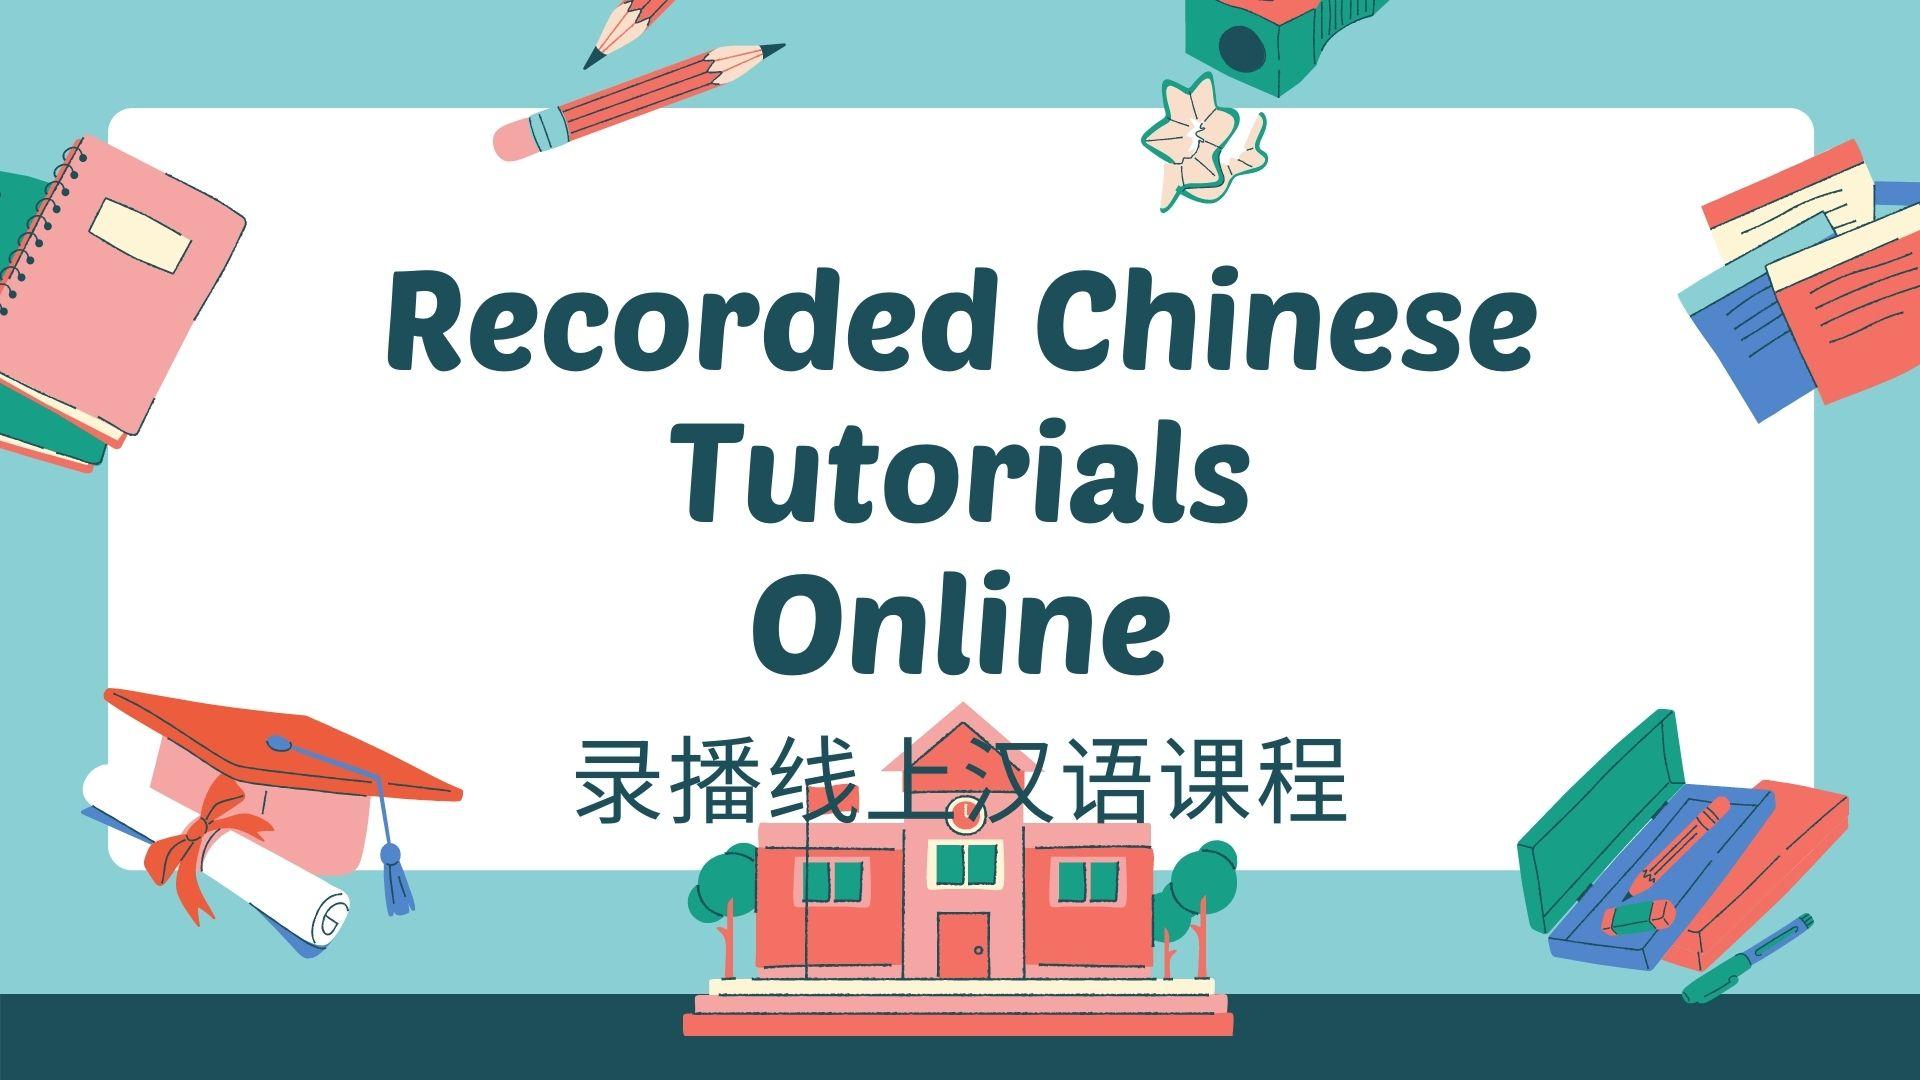 recorded chinese tutorials